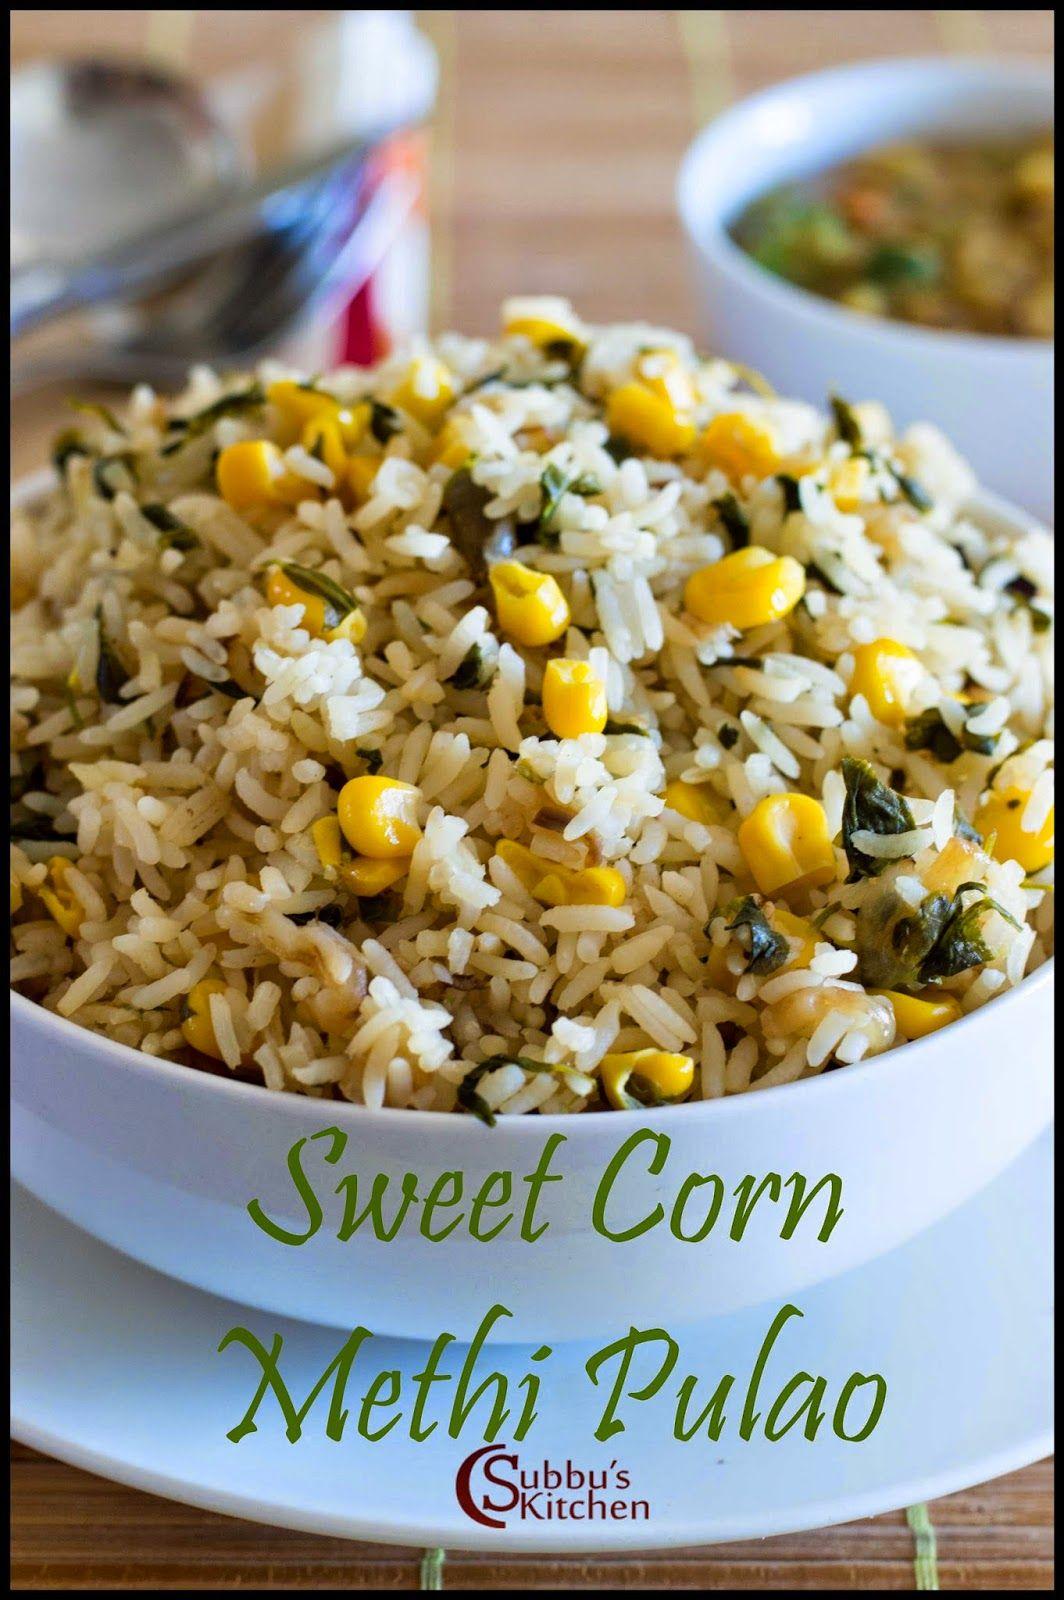 Sweetcorn methi pulao recipe recipes to cook pinterest recipe sweetcorn methi pulao recipe ccuart Choice Image